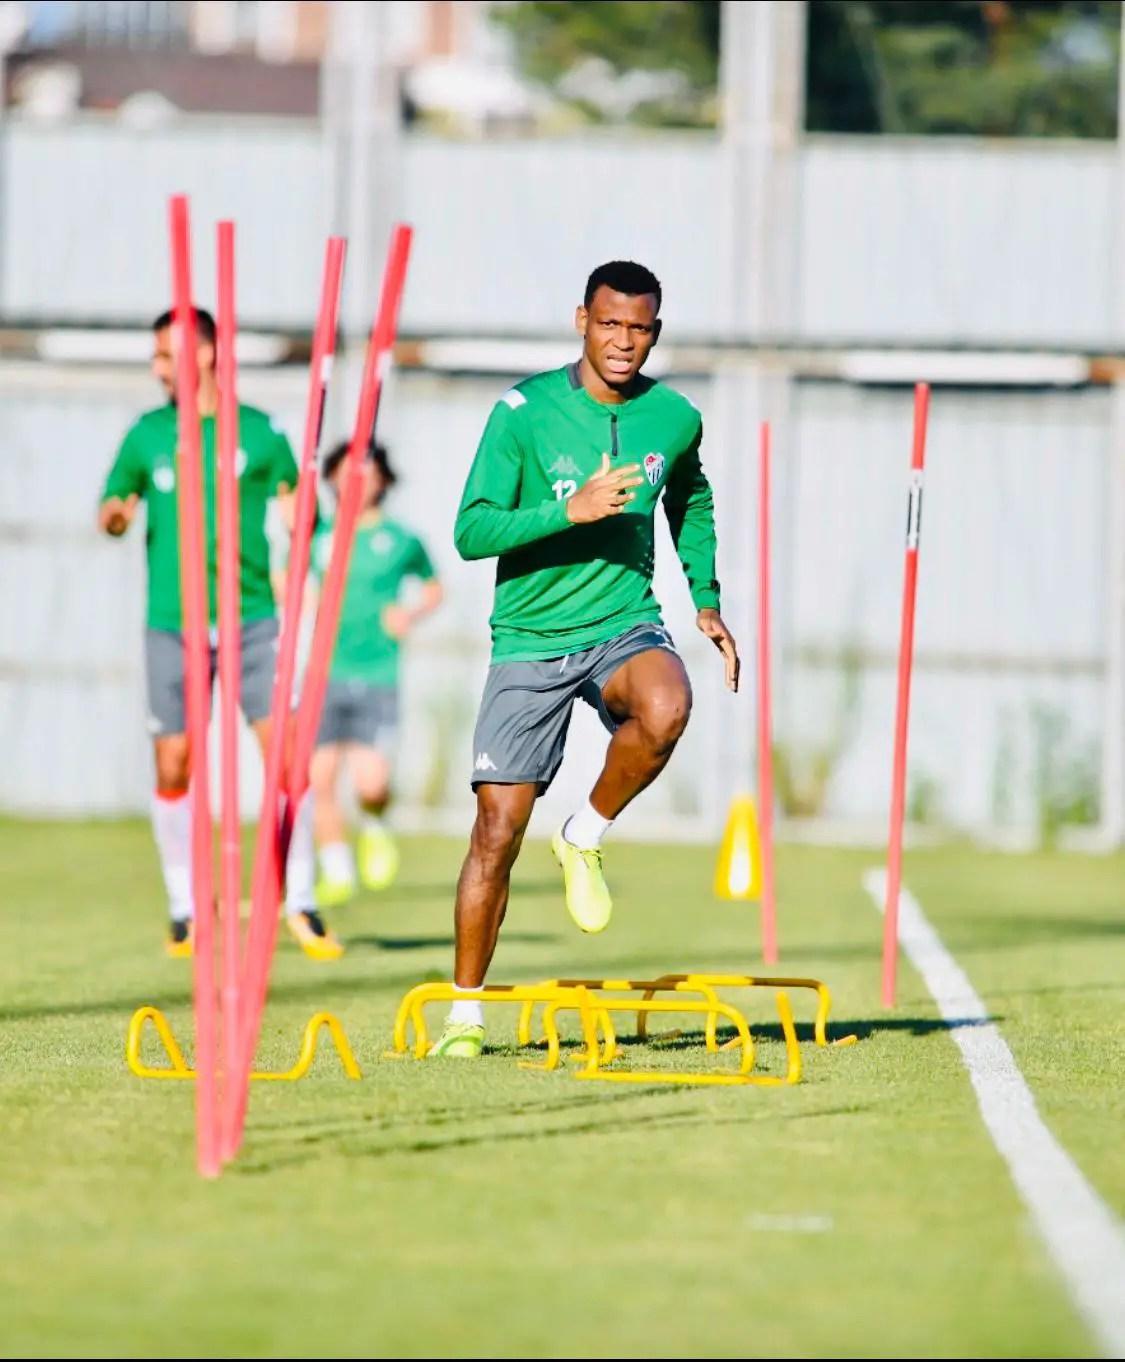 Coronavirus: Abdullahi Happy To Be Back In Training With Bursaspor